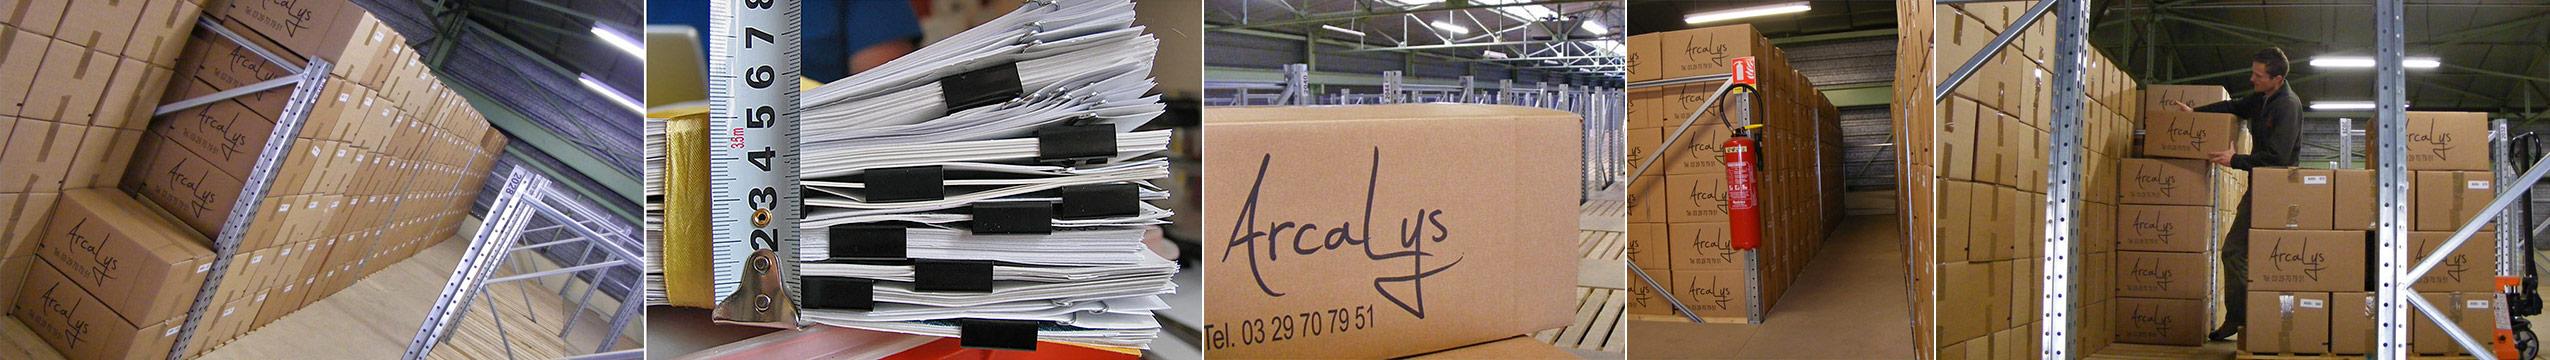 Arcalys - Charte Qualité